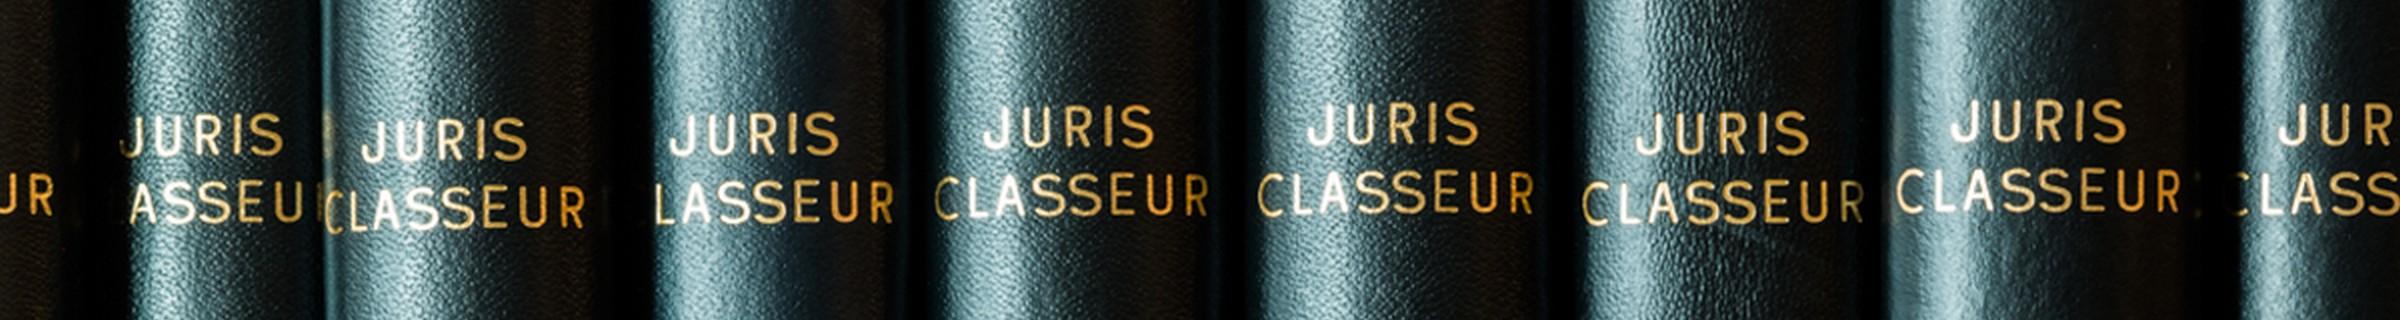 Jurisclasseur